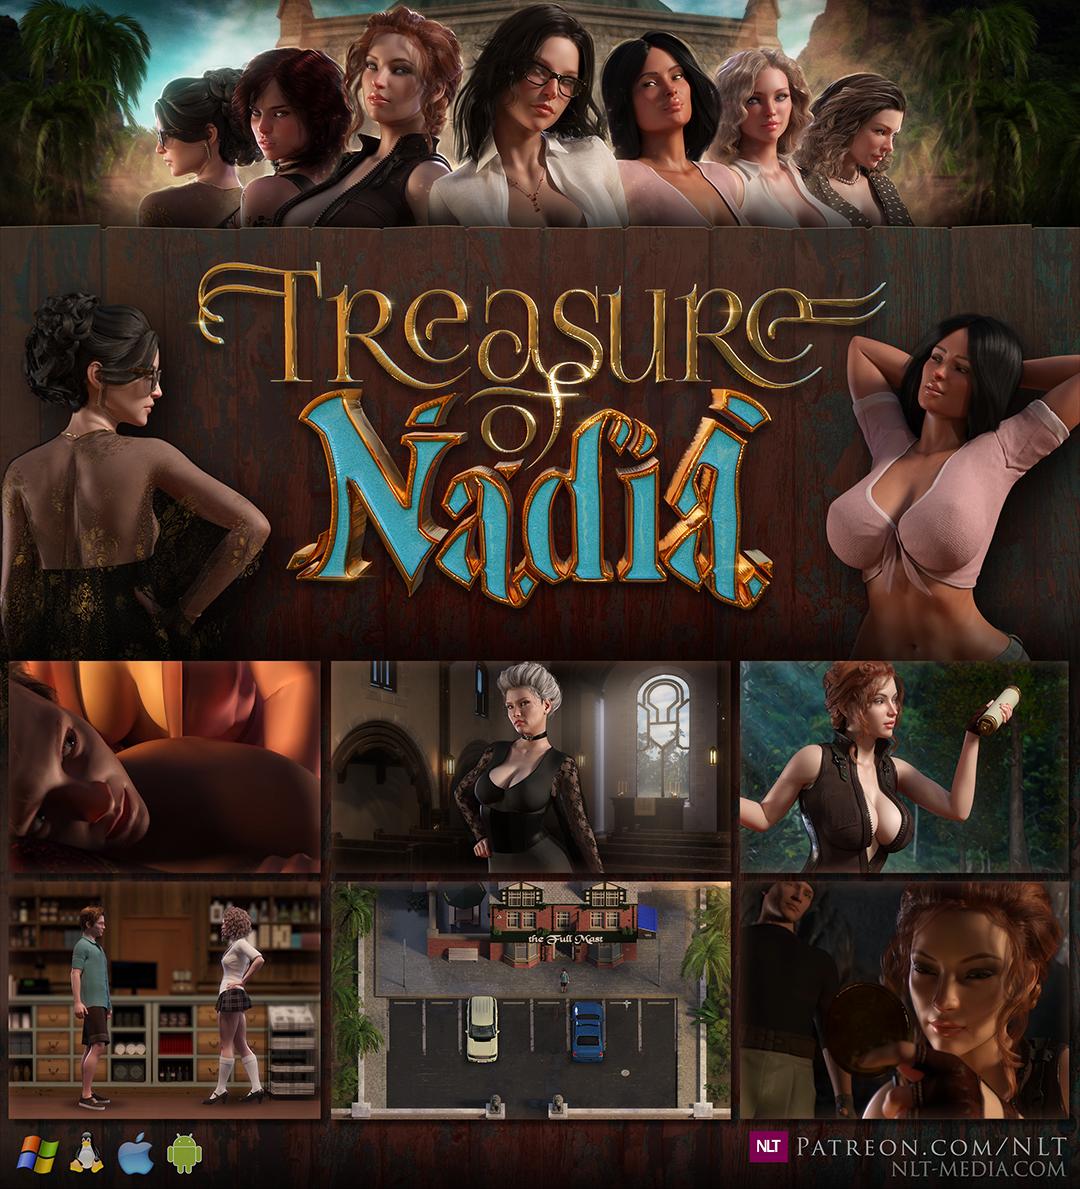 Treasure of Nadia (MOD APK) v1.91 5